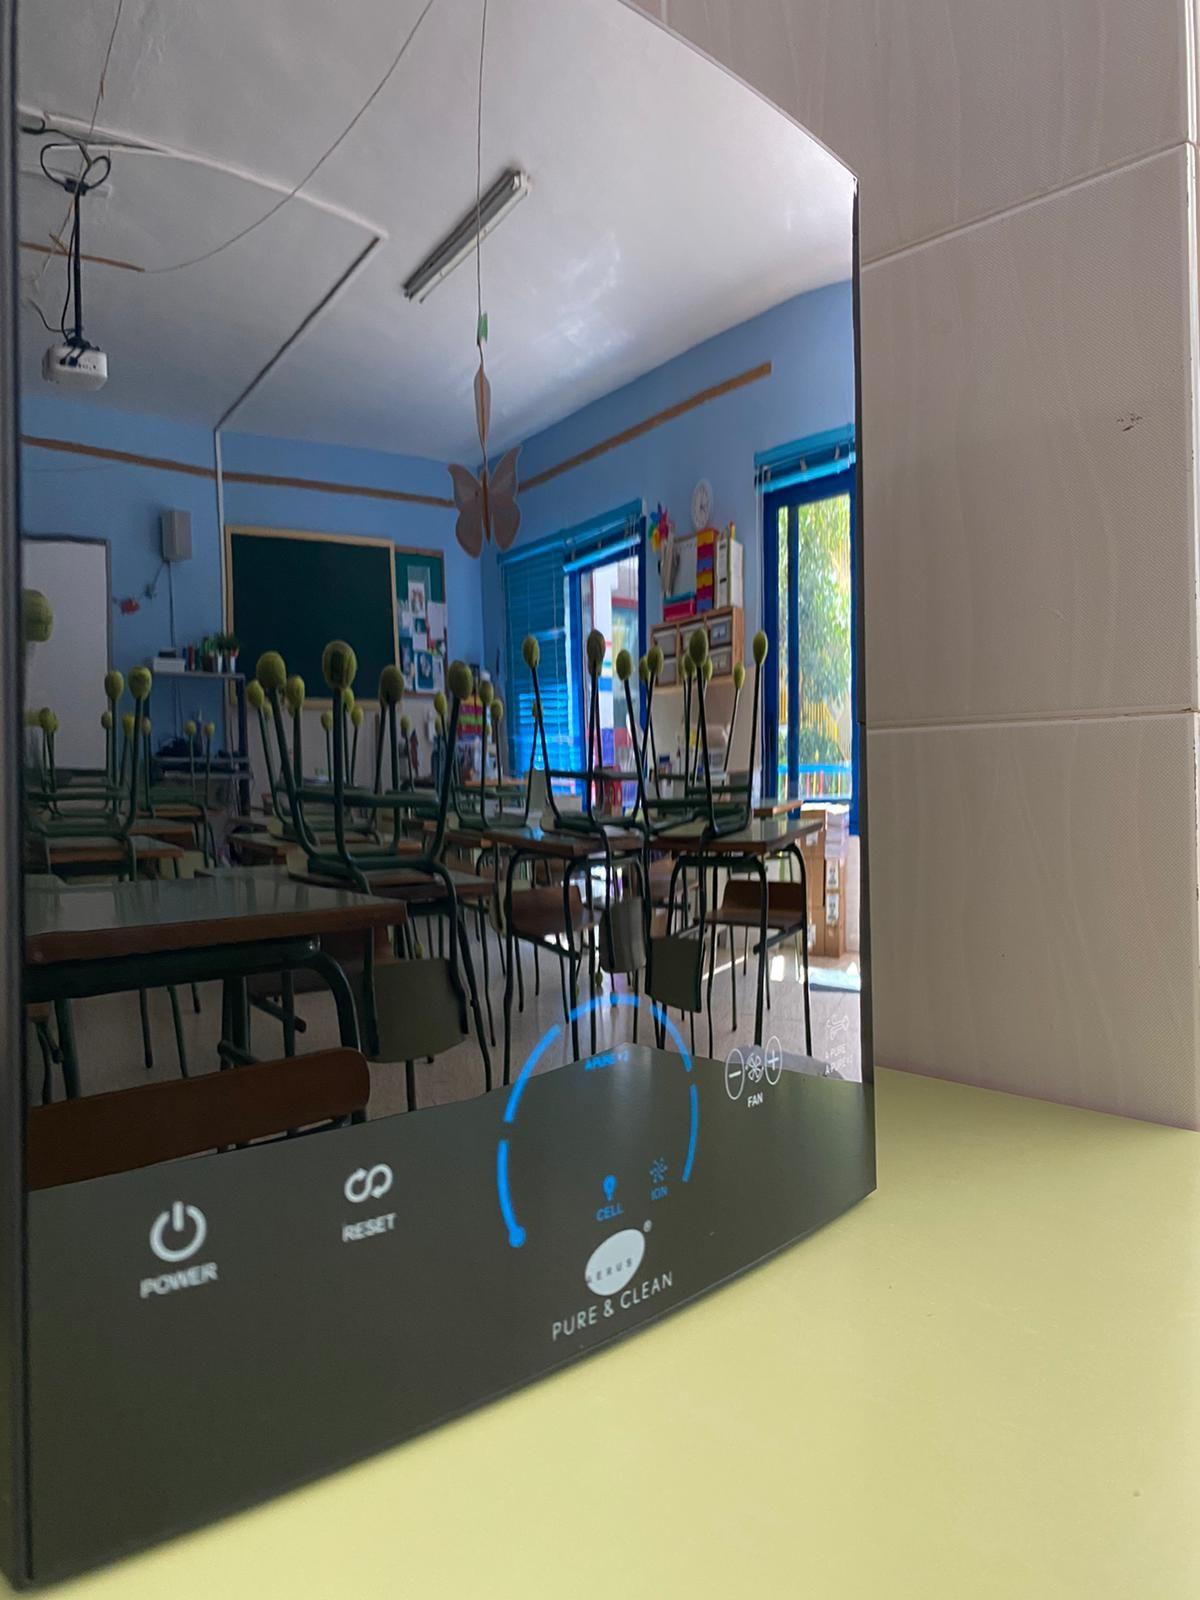 Foto de Pure and Clean en aula